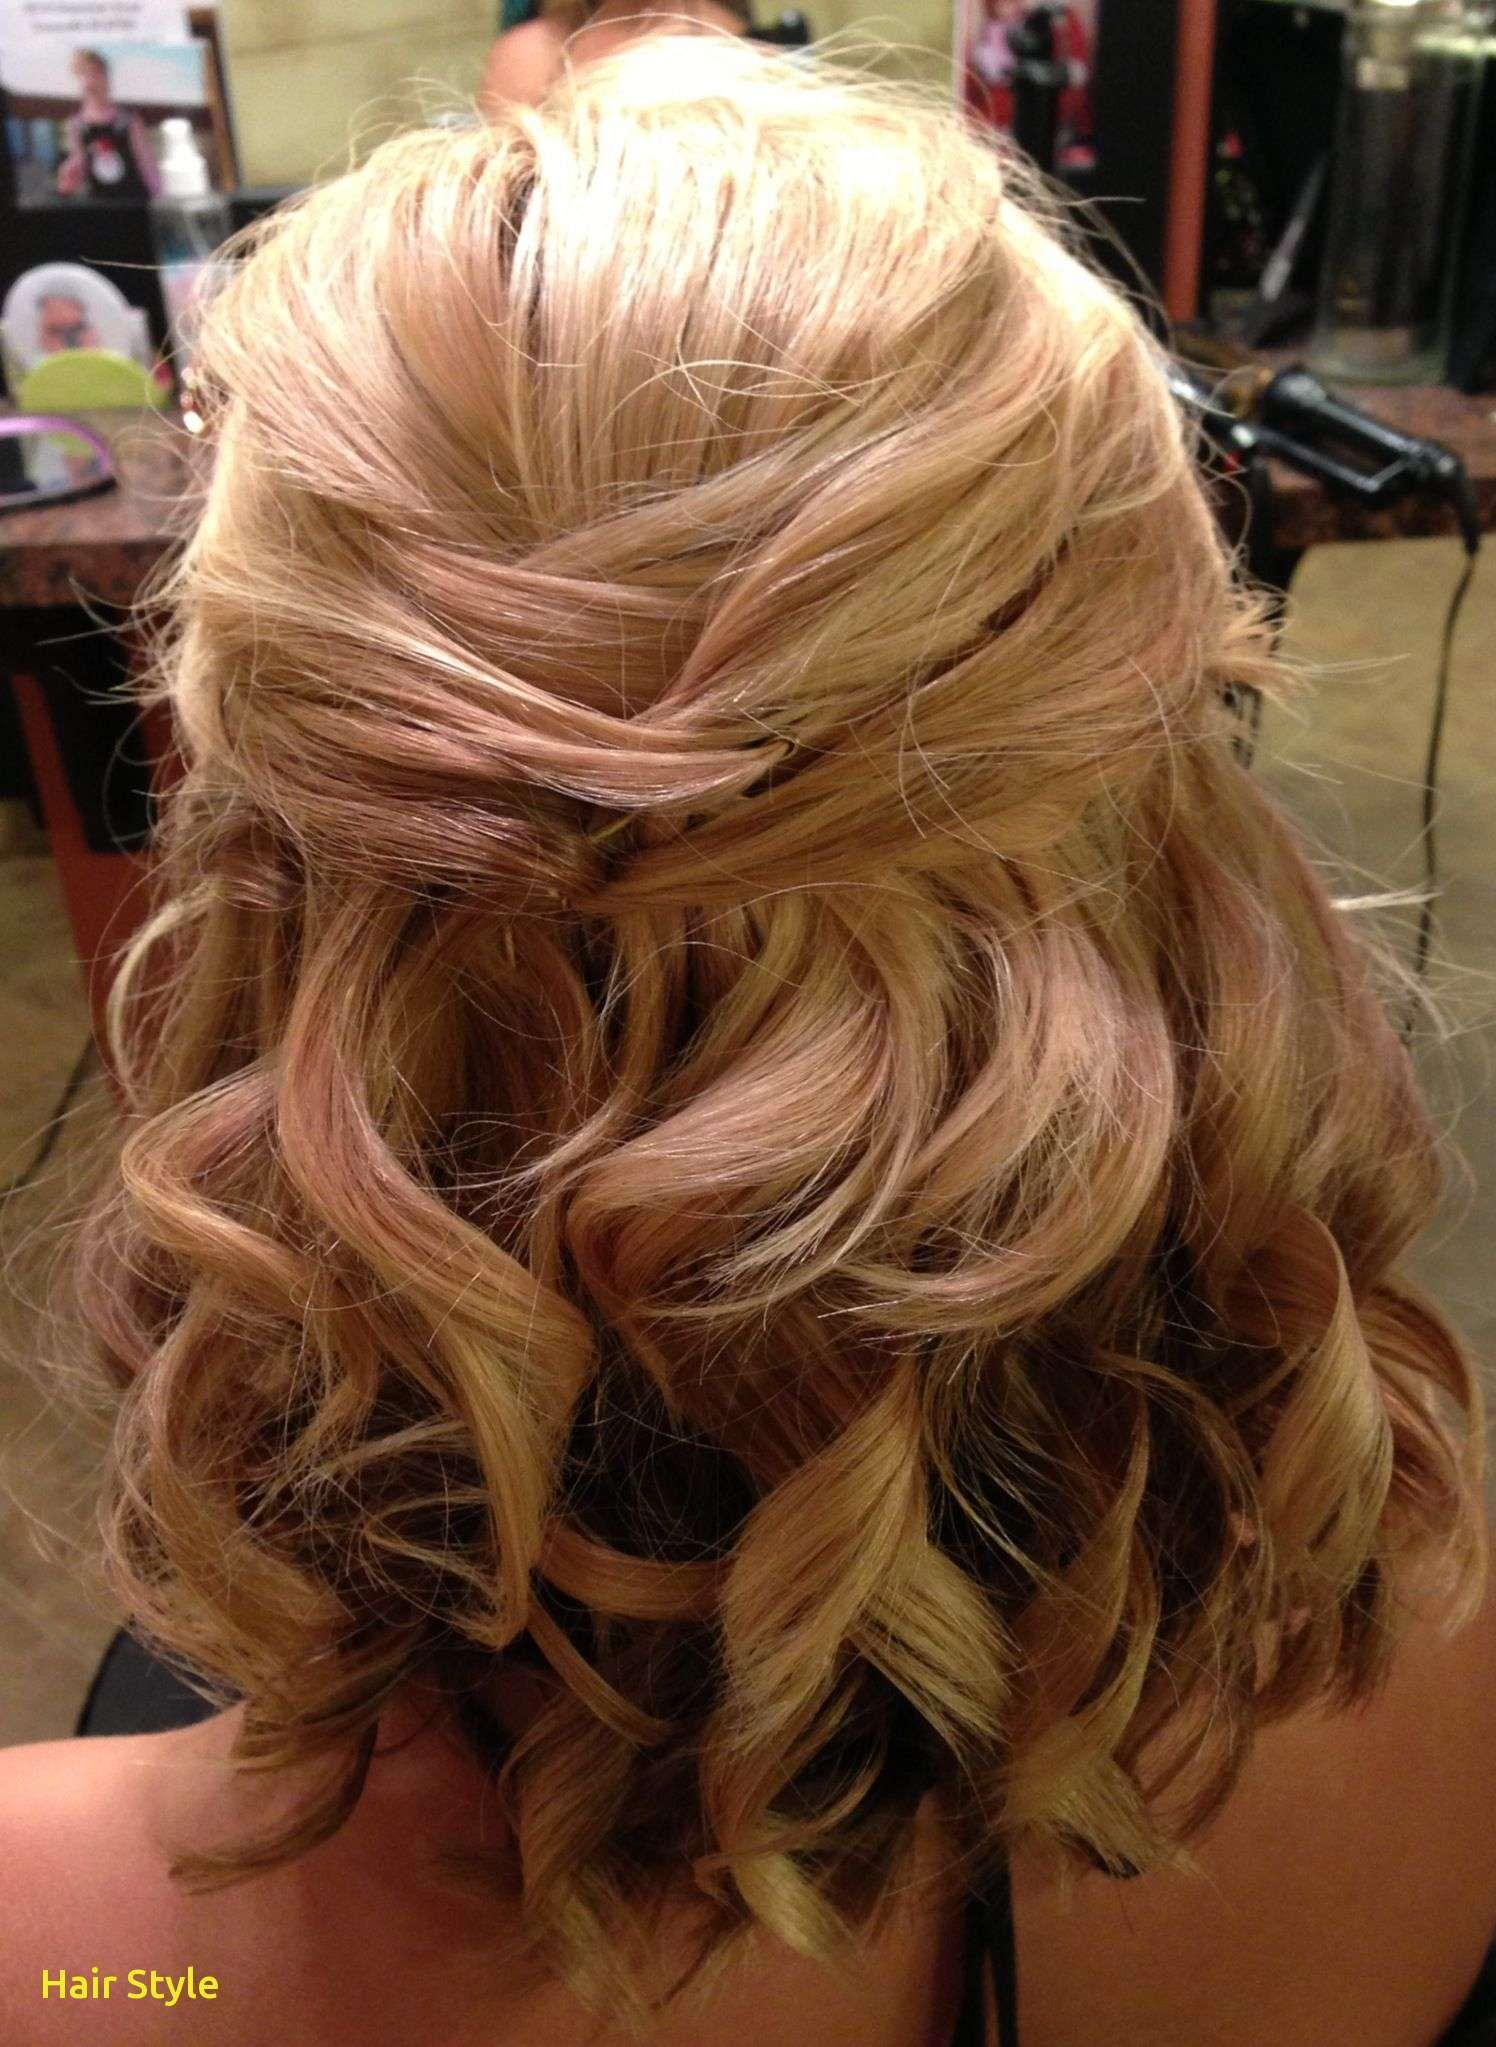 Frisuren Halblang Brautmutter